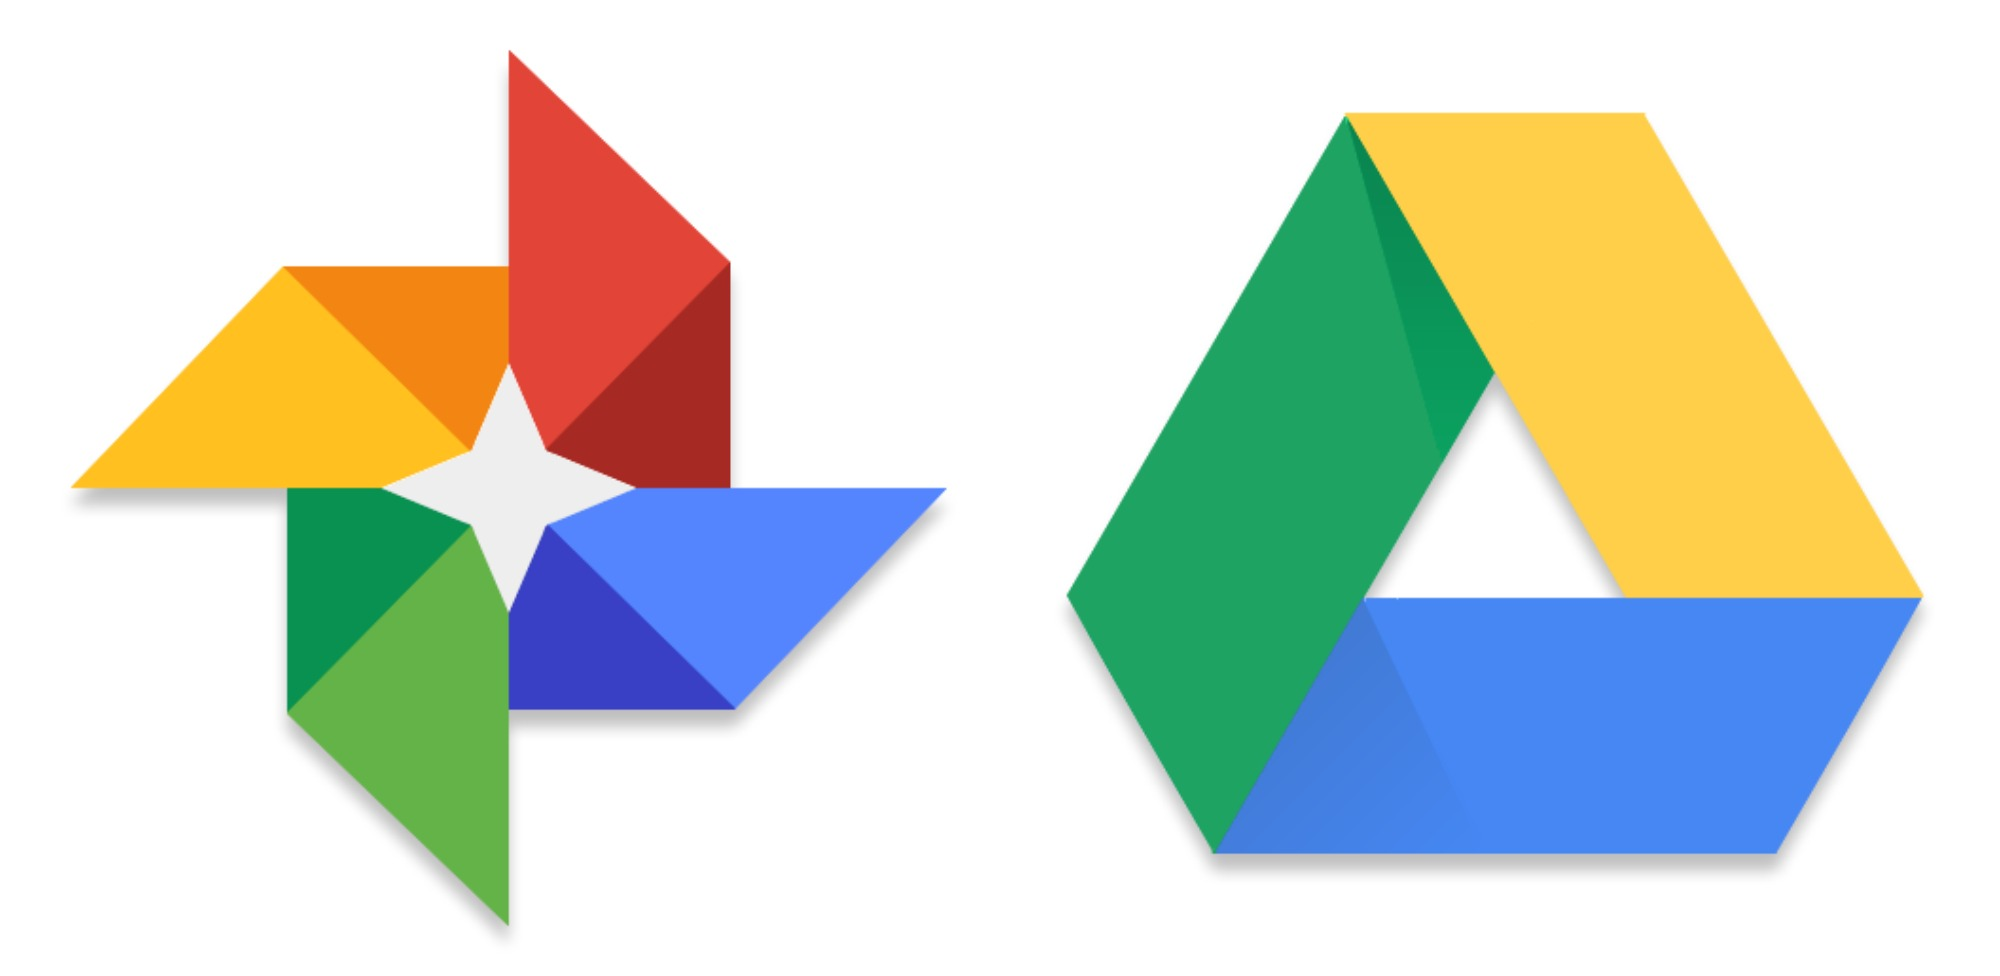 Psa Here S What Happens When You Delete Google Photos